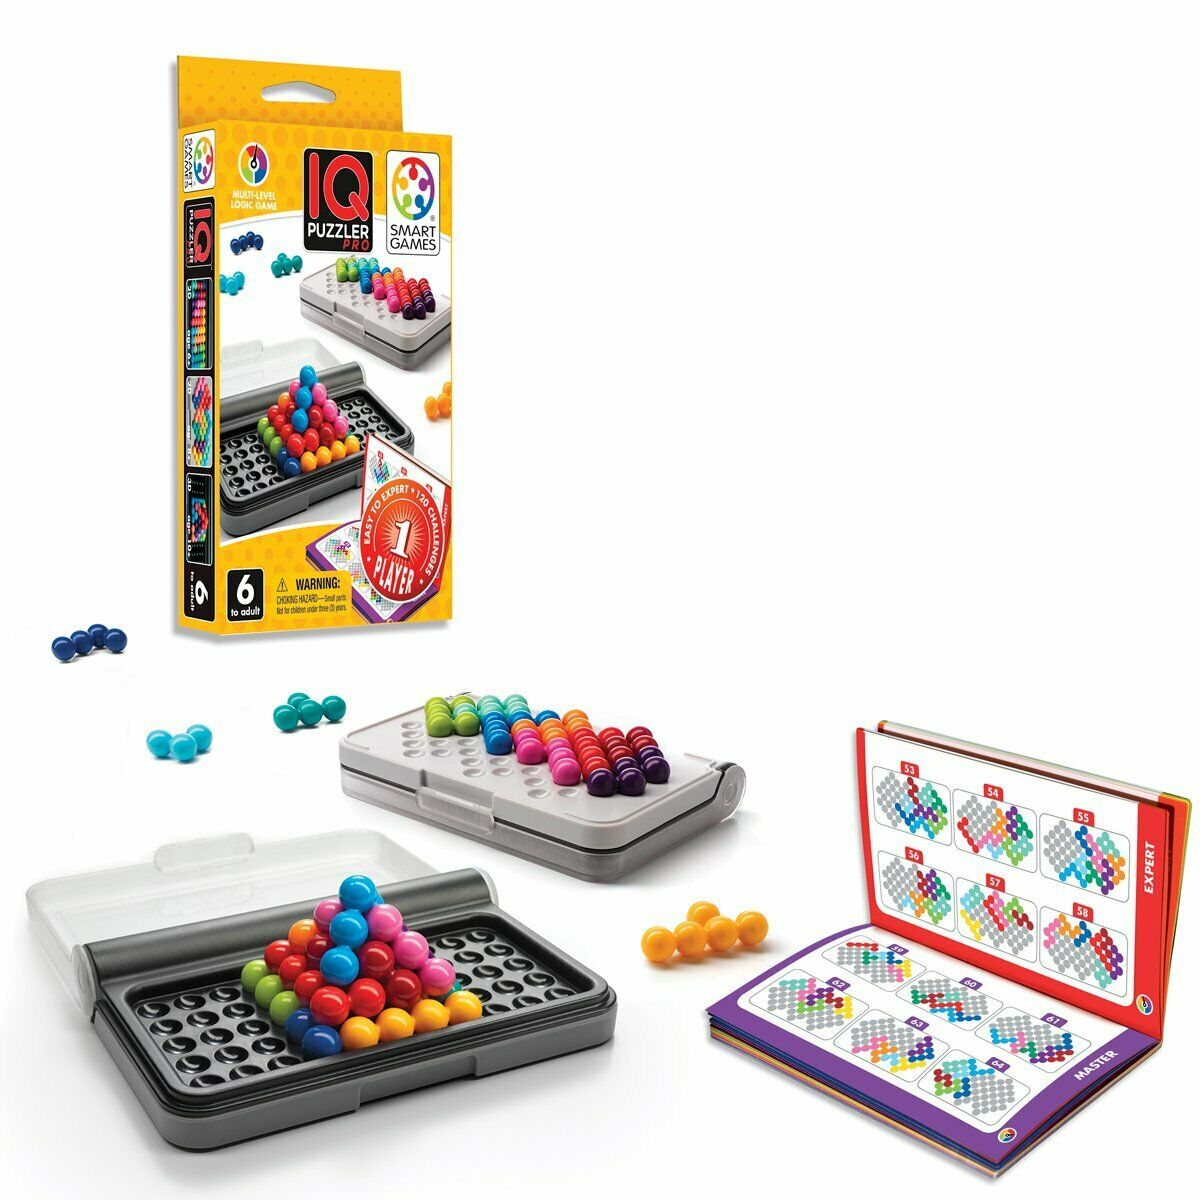 Smart Games IQ Puzzler Pro Logic Educational Travel Game Toy Kids Brain Teaser 2